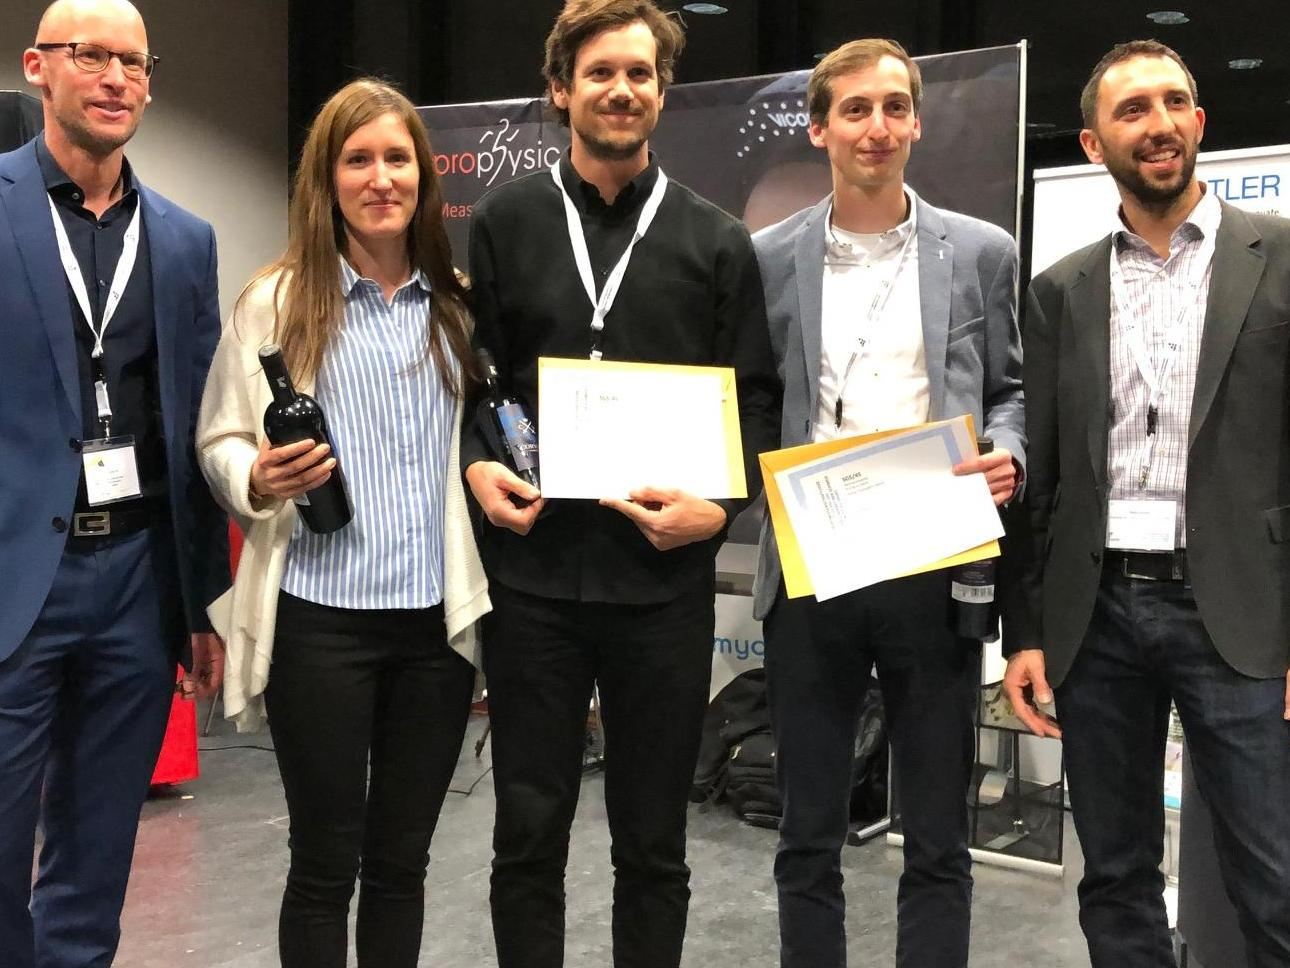 Marie Simonet, doctorante à l'ISSUL a reçu le 3ème prix du Young Investigator Award